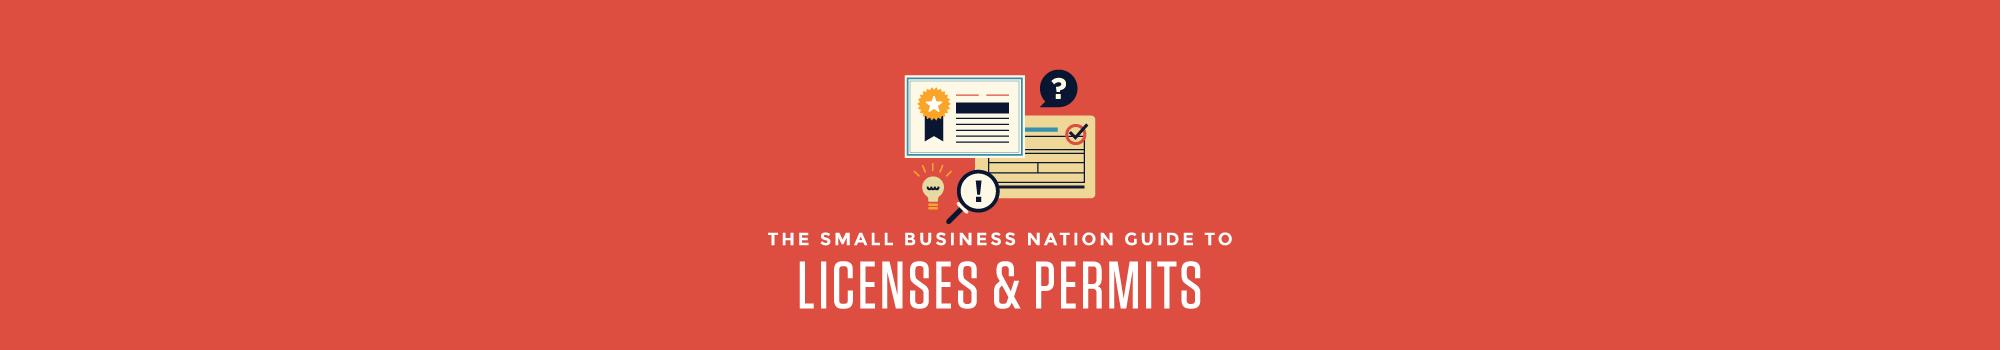 SBN_carousel_2017_Licenses&Permits copy.png